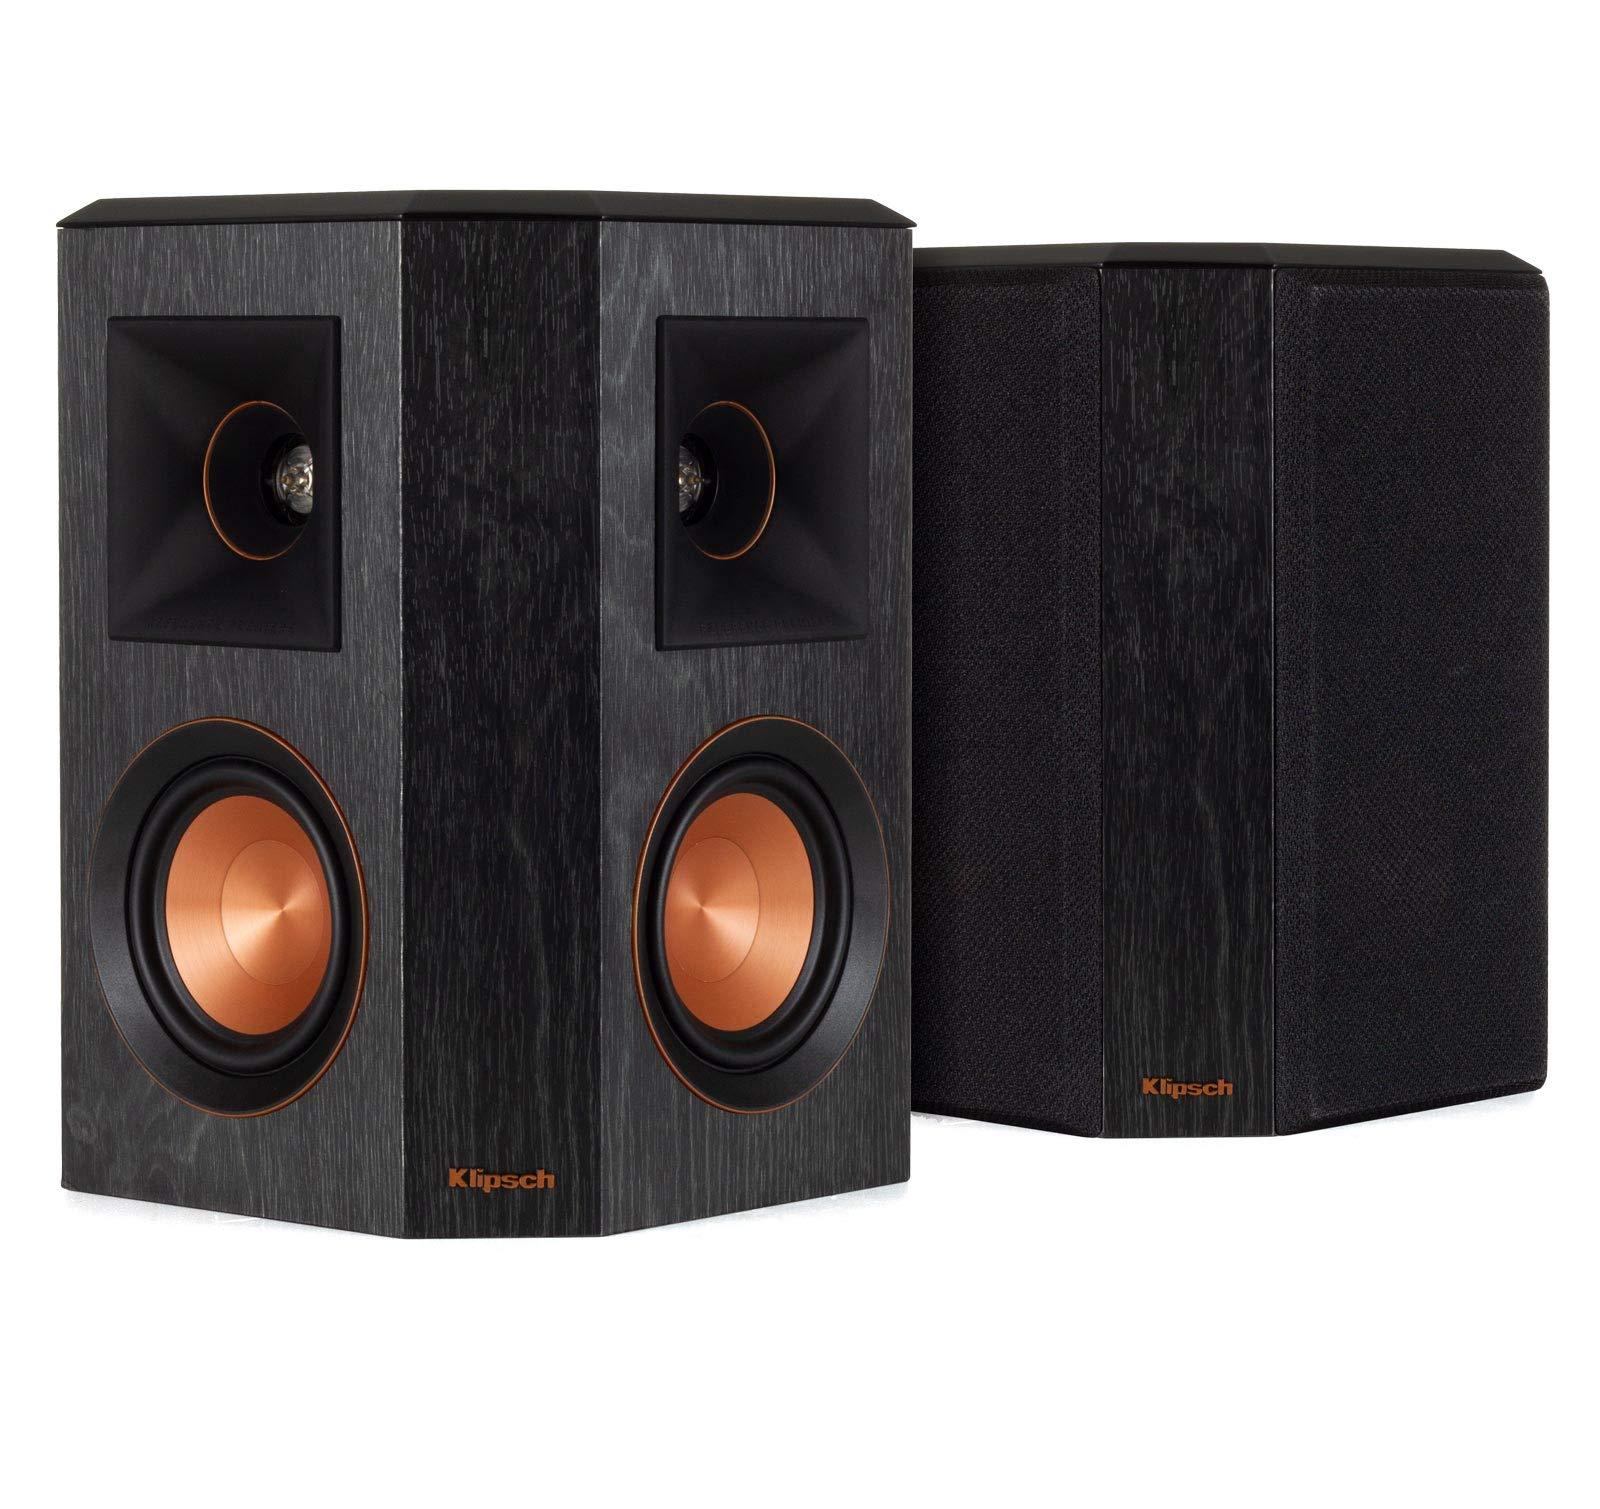 Klipsch RP-402S Reference Premiere Surround Speakers - Pair (Ebony) (Renewed)